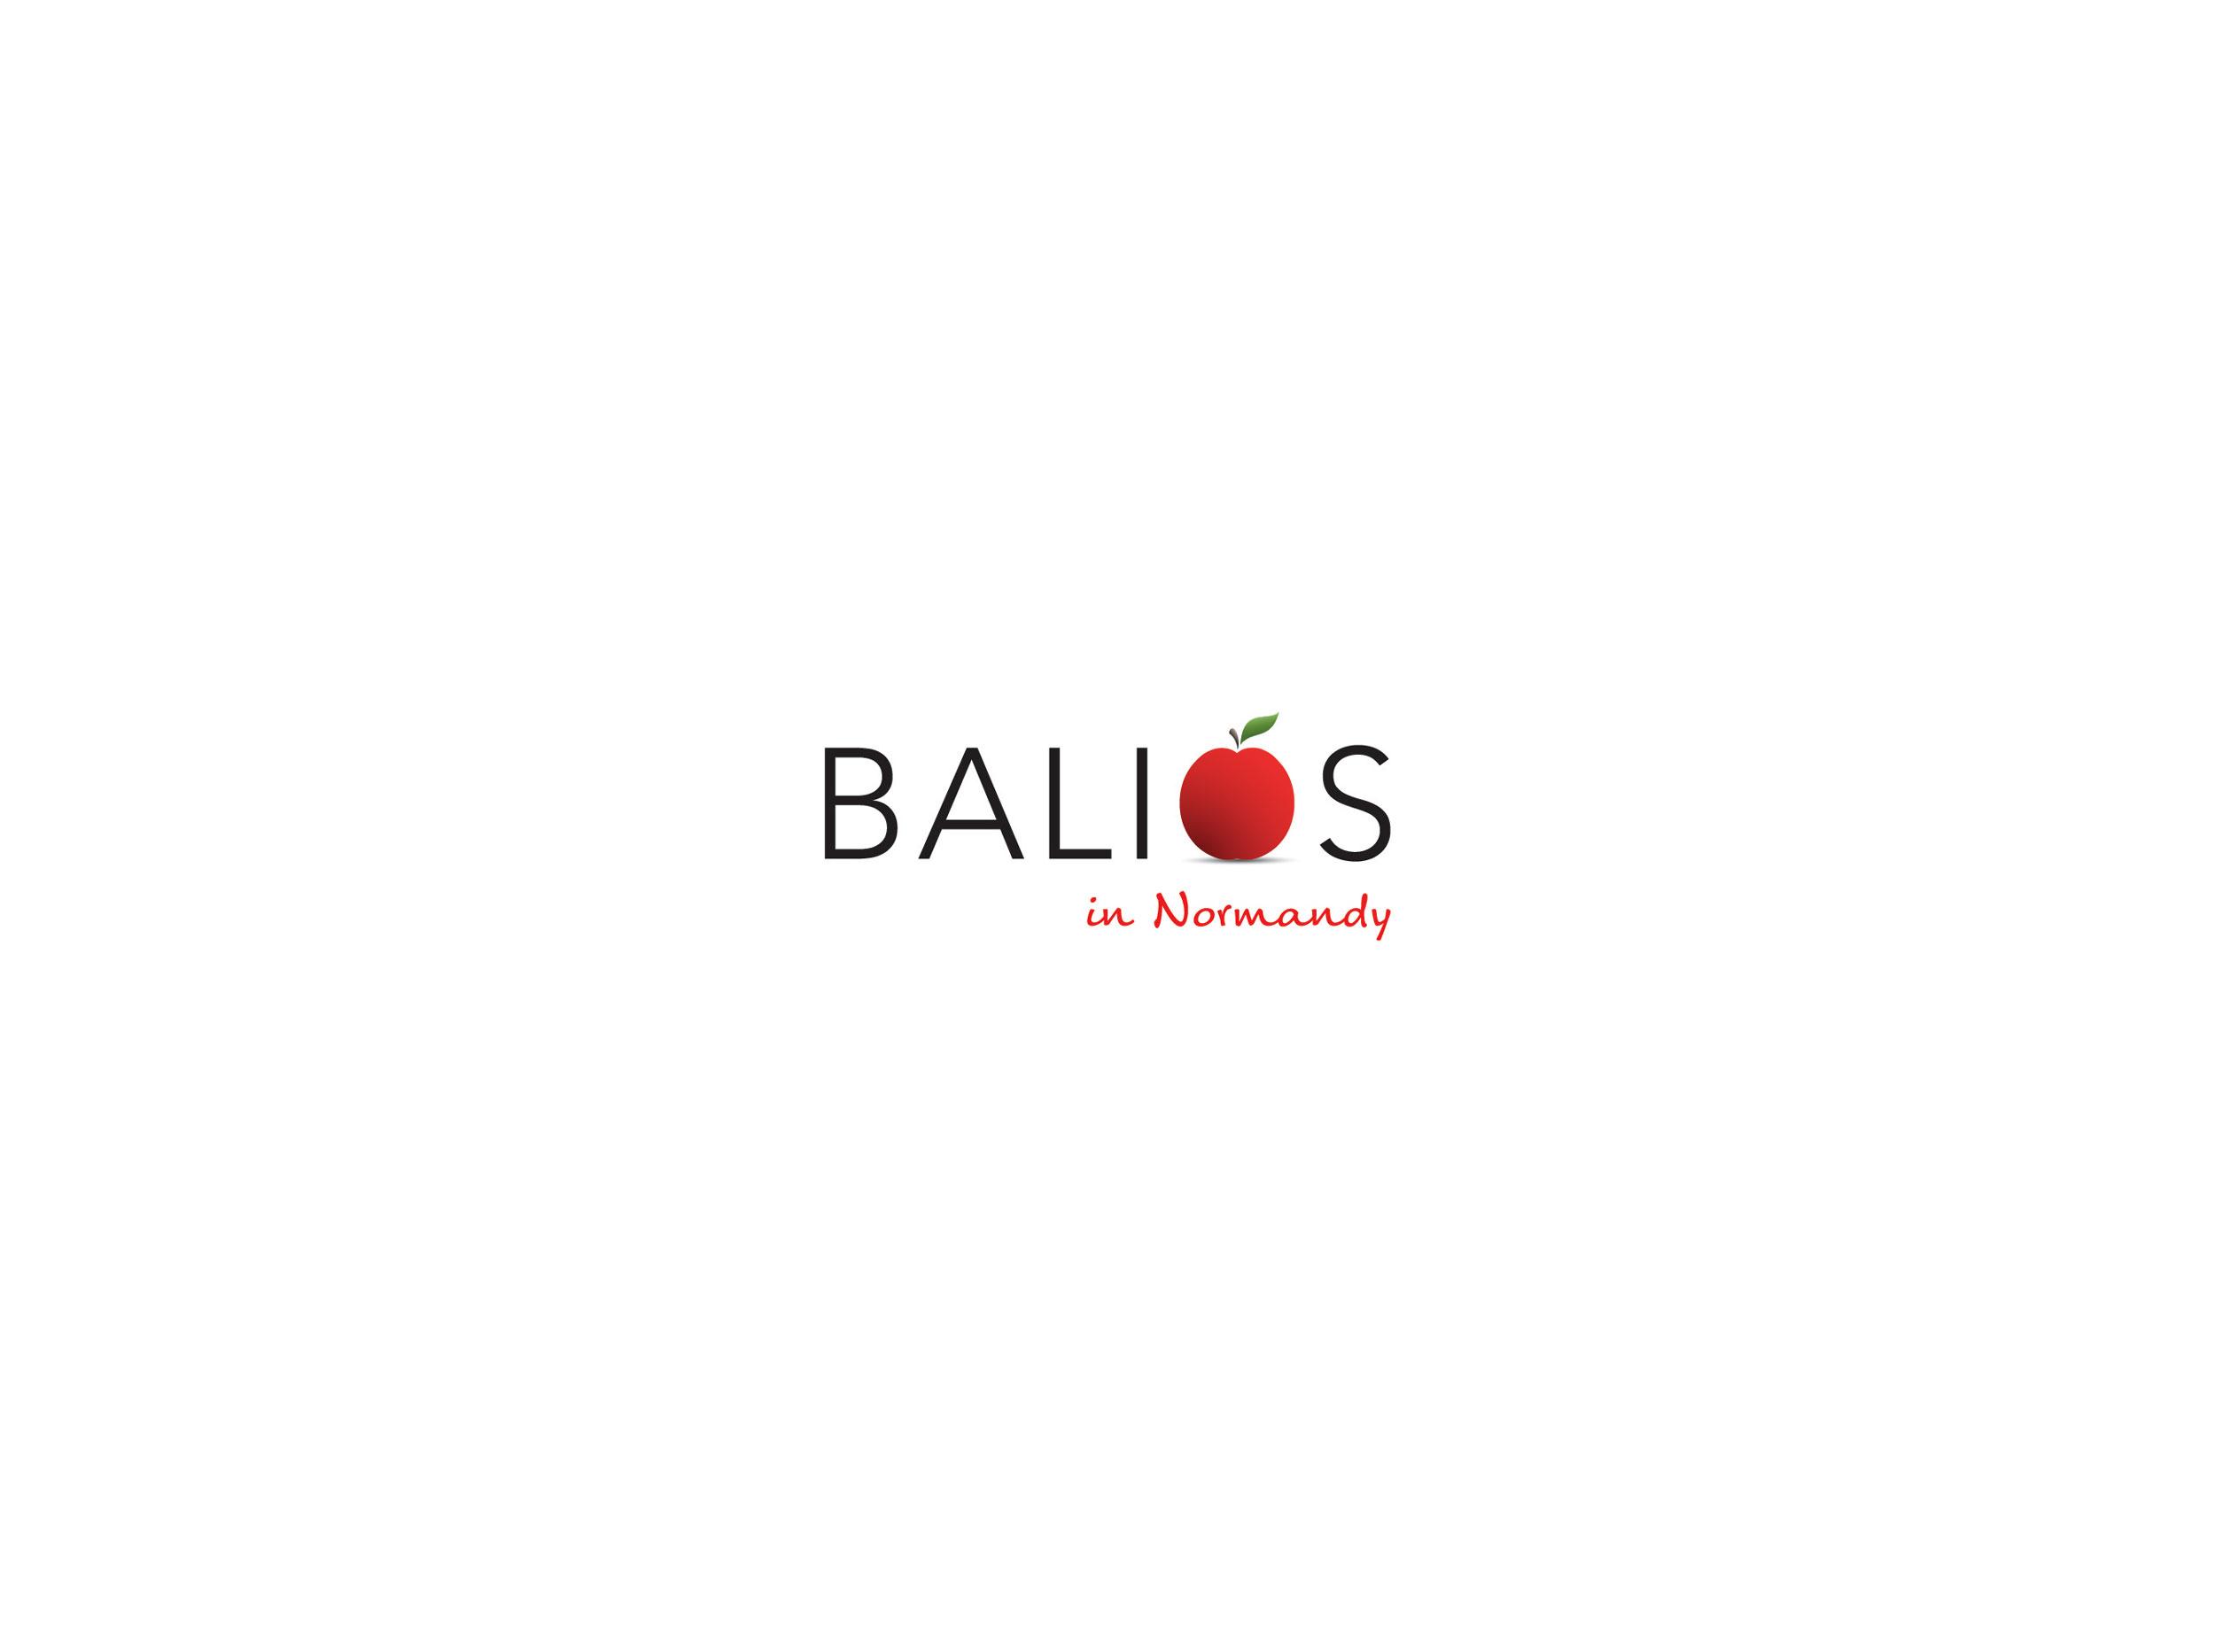 balios-logo.jpg